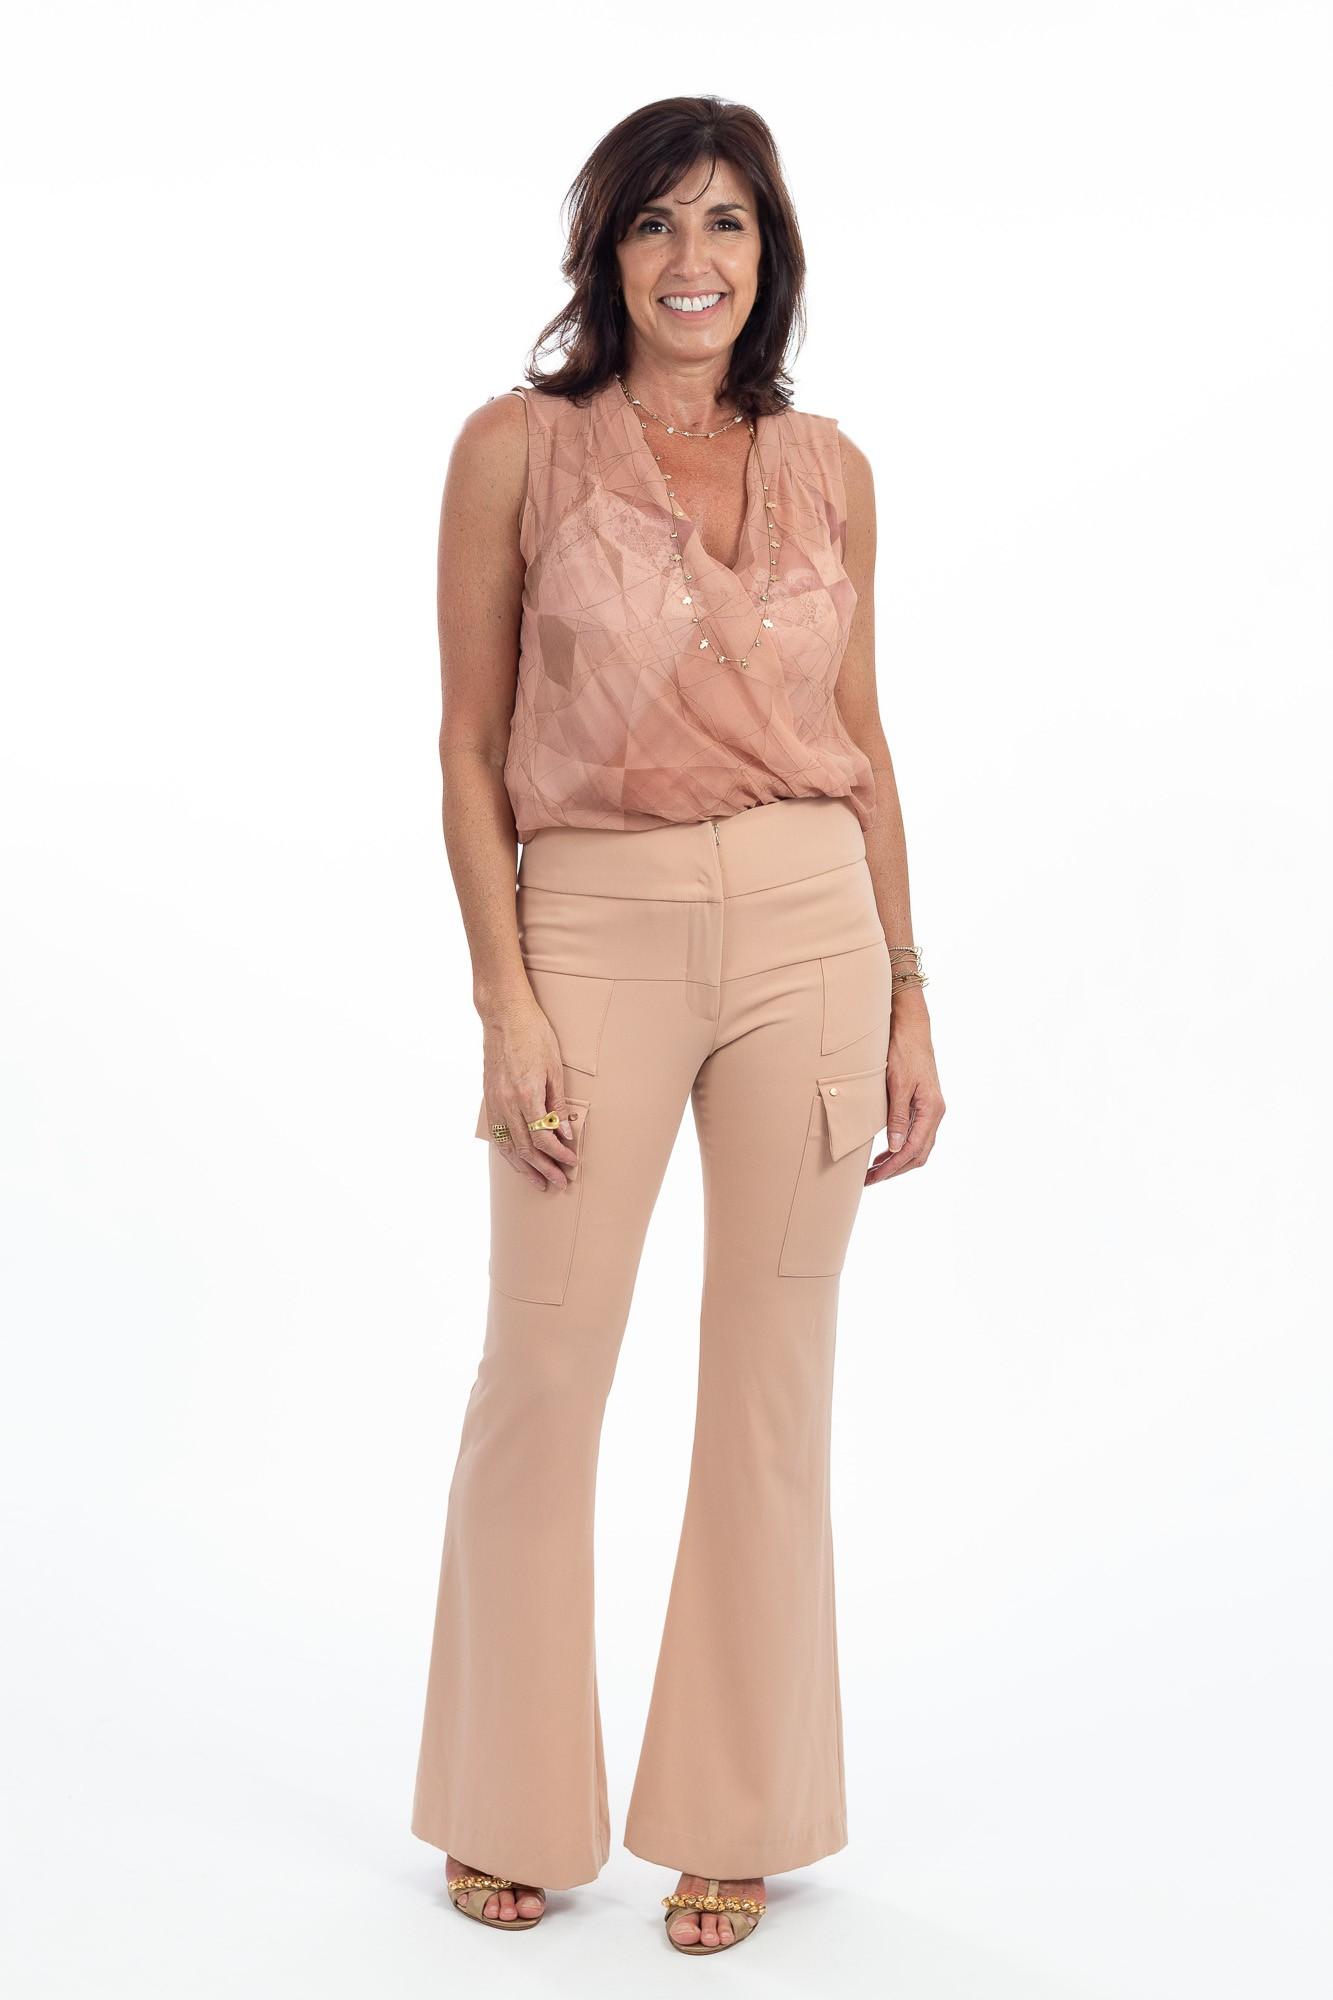 Calça pantalona rosa seco Animale tam 36